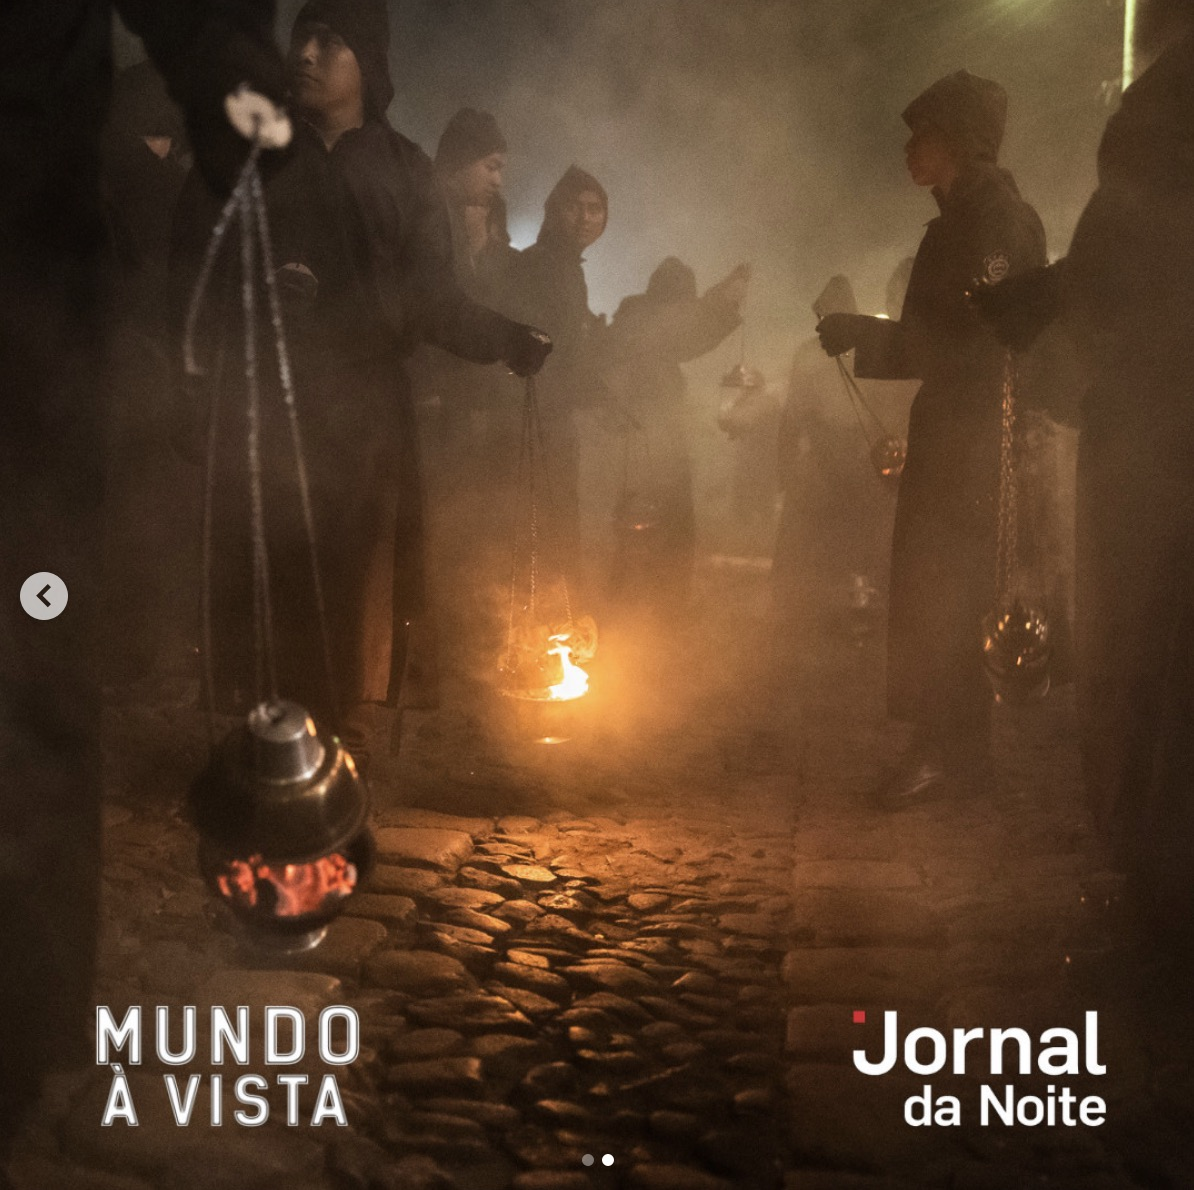 Mundo-a-vista-joel-santos-jornal-da-noite-sic-noticias-guatemala-semana-santa-2.jpg